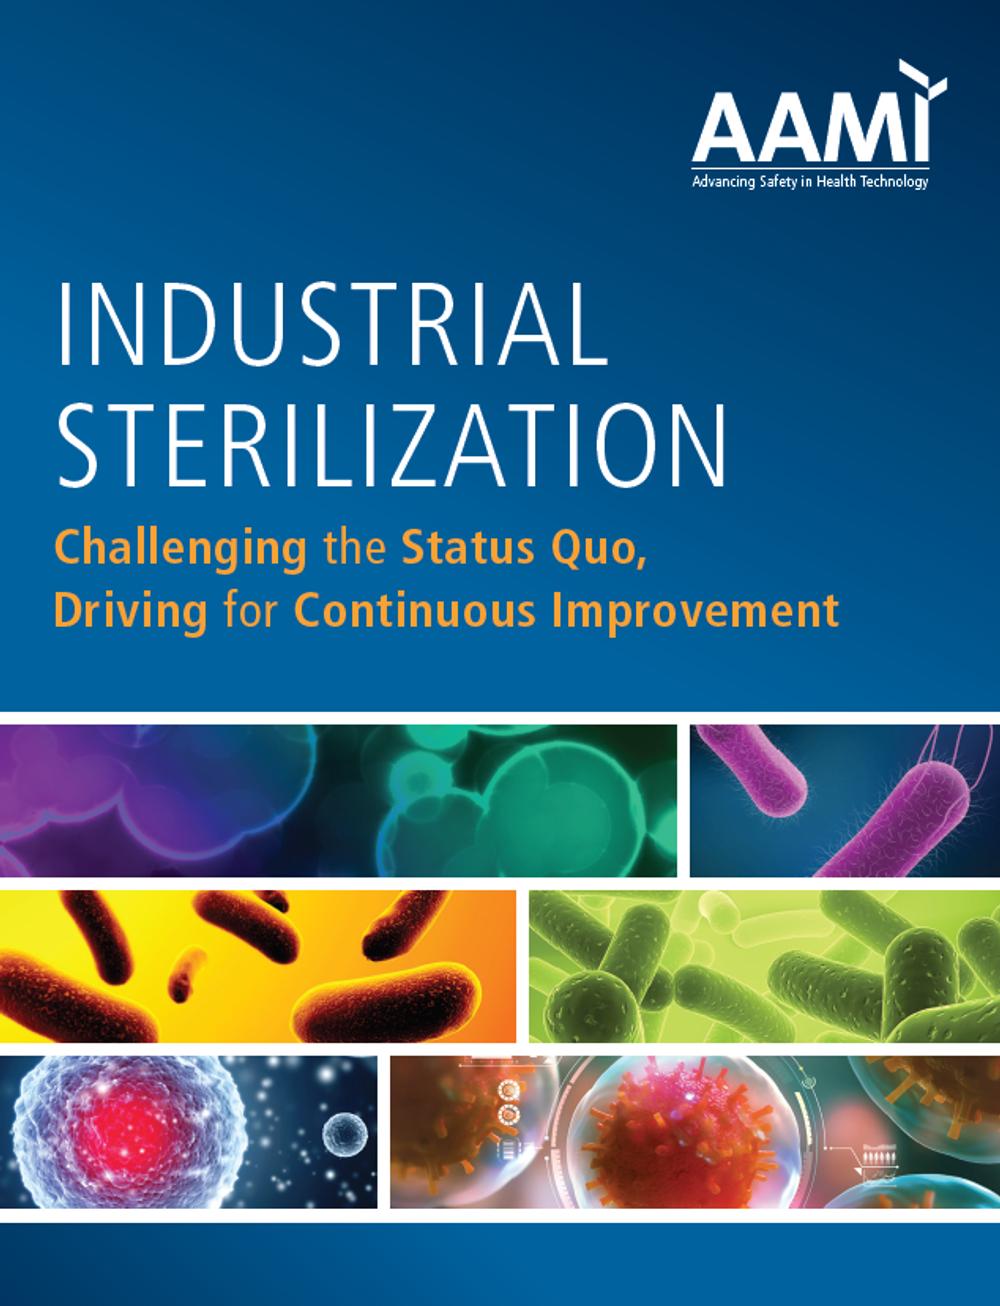 AAMI Industrial Sterilization 21 Cover